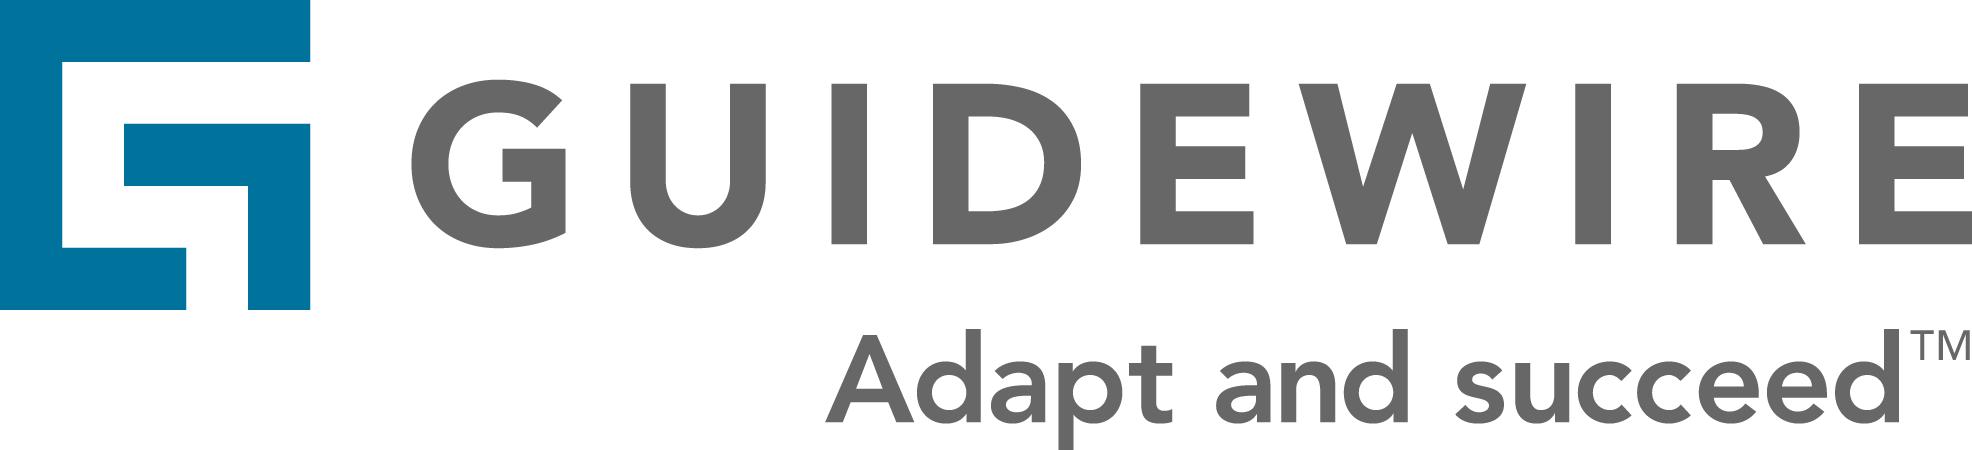 Guidewire Logo, Insurance Innovators sponsor